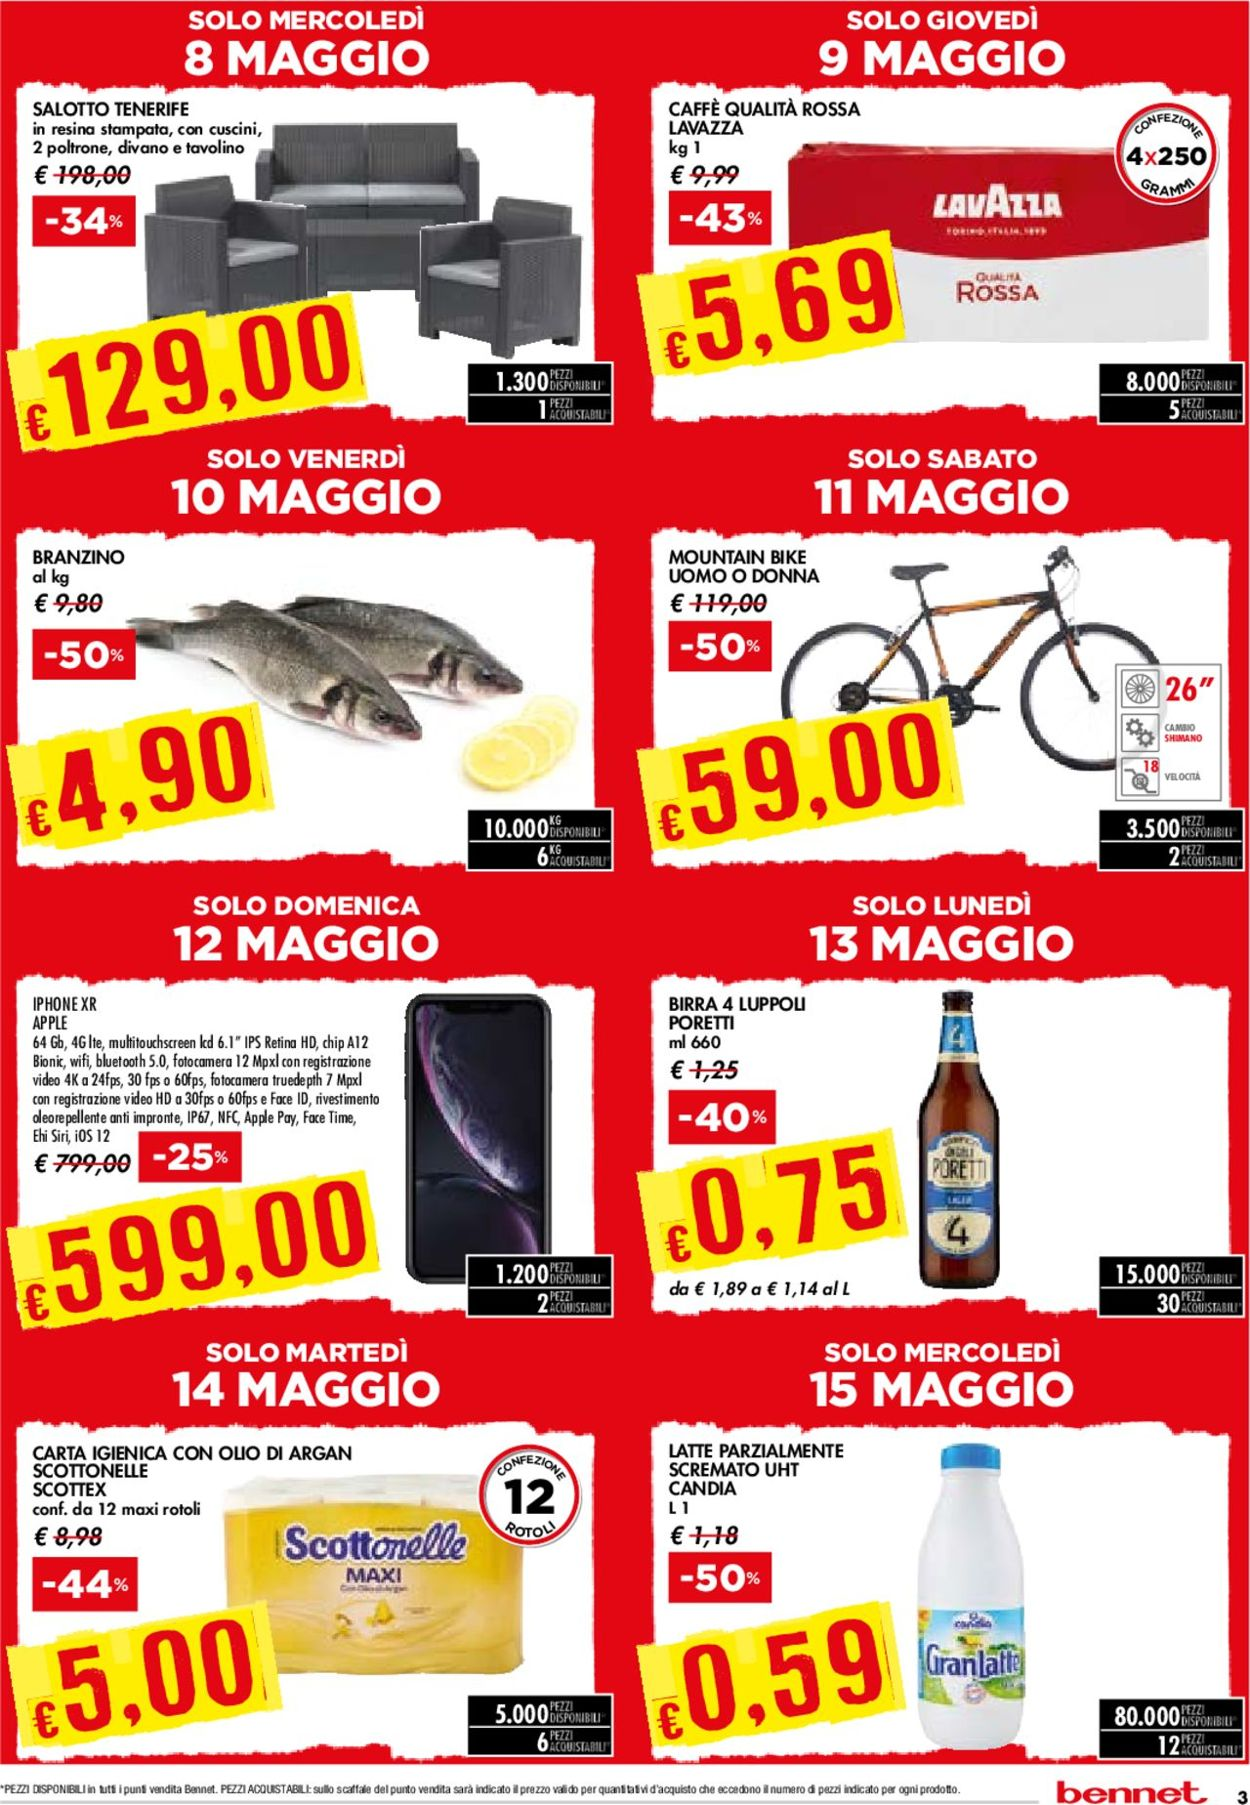 Volantino bennet - Offerte 02/05-15/05/2019 (Pagina 3)